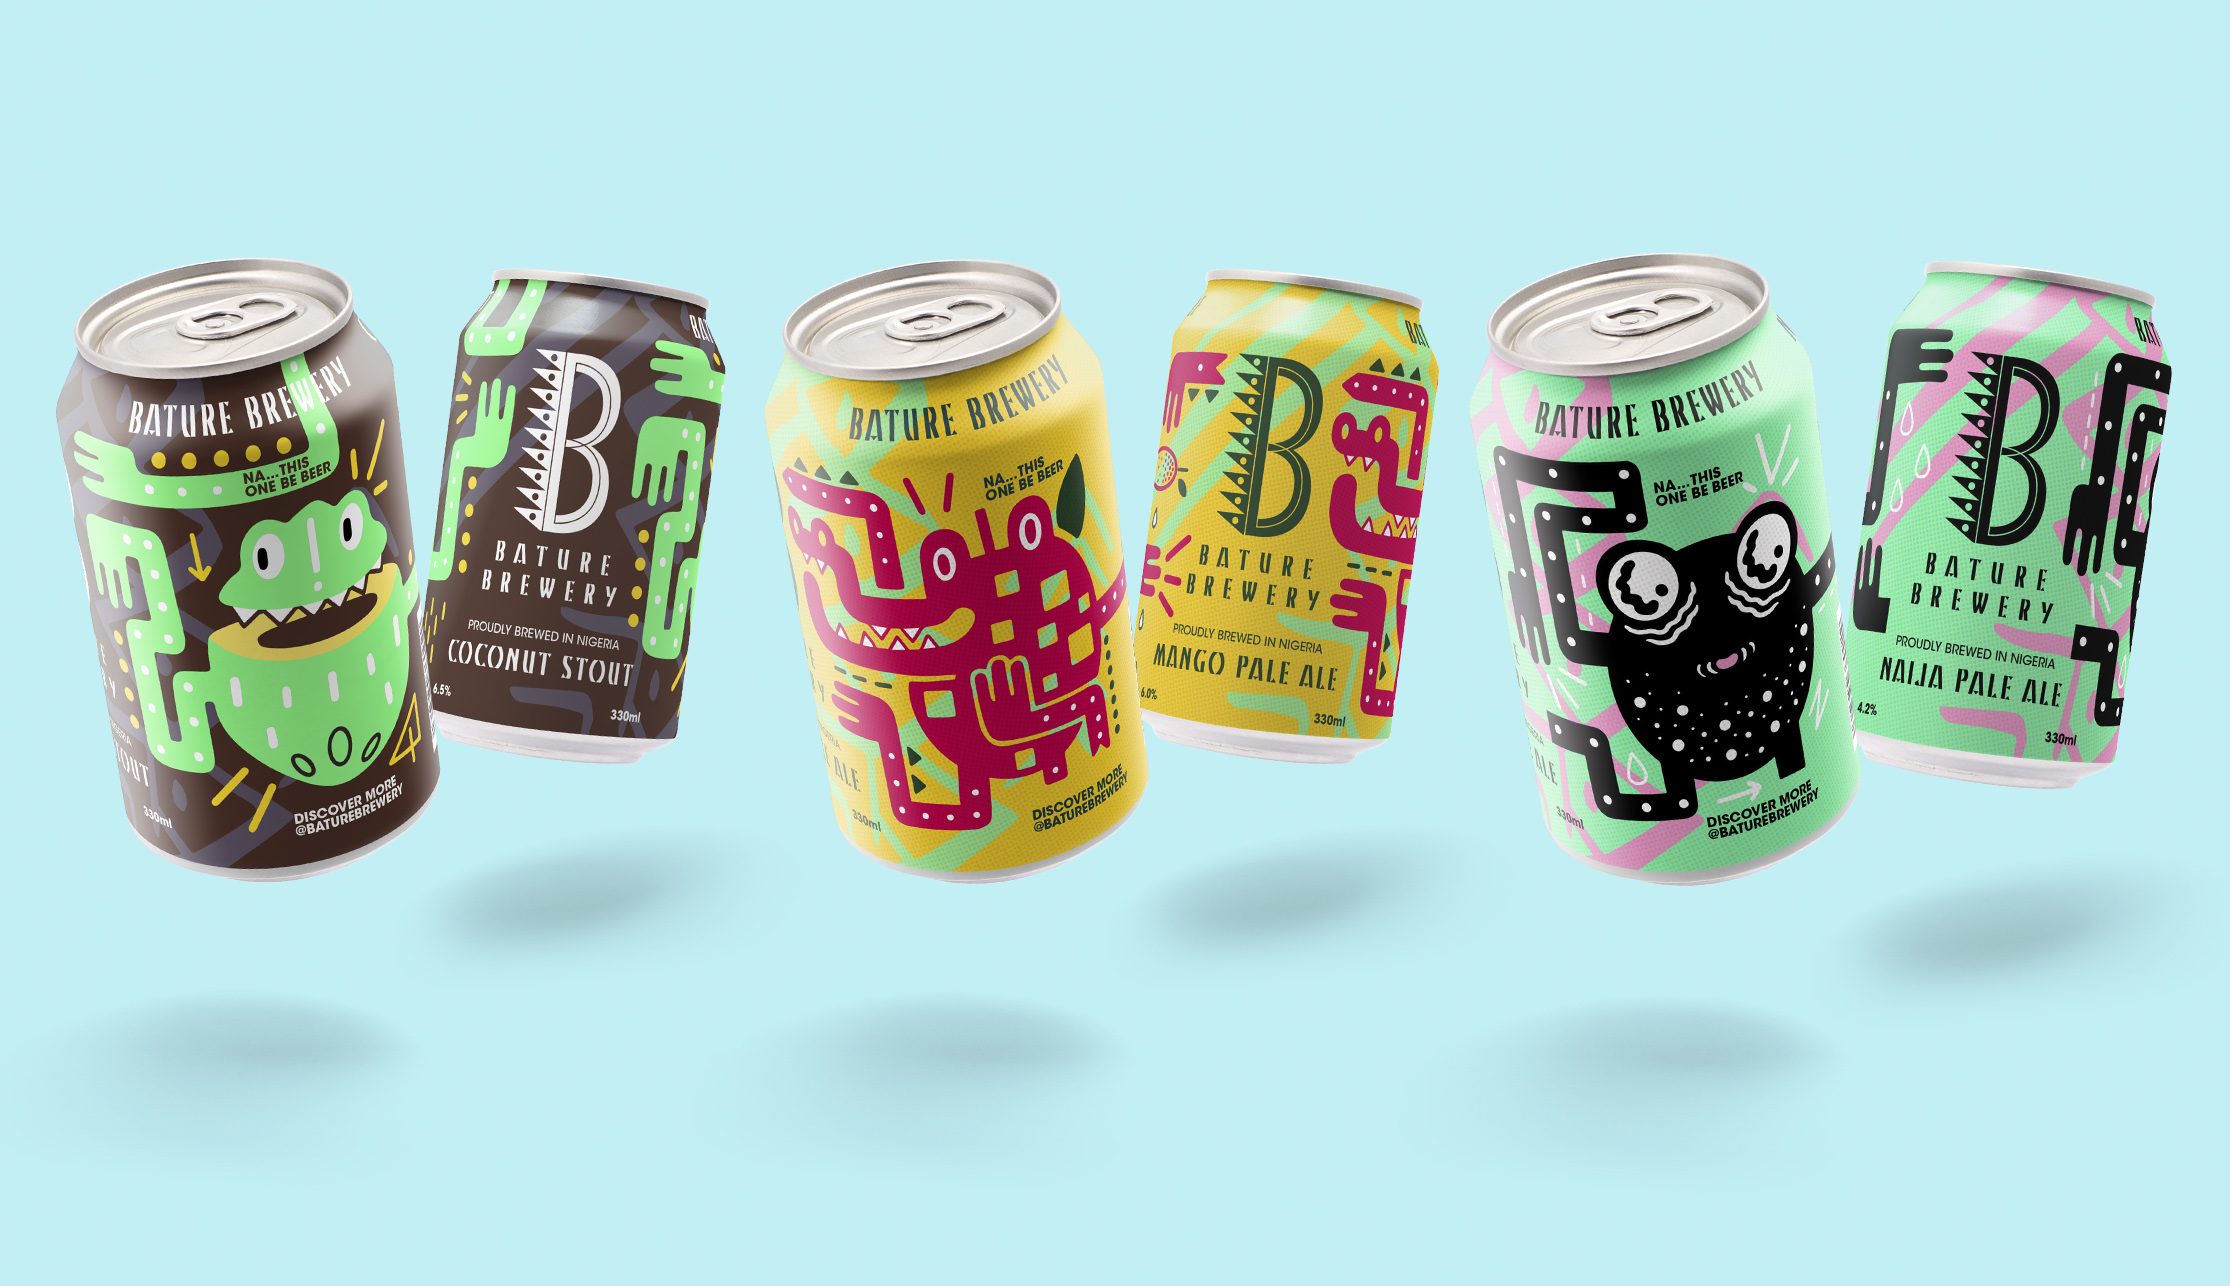 Bature Brewery – Seasonal Range